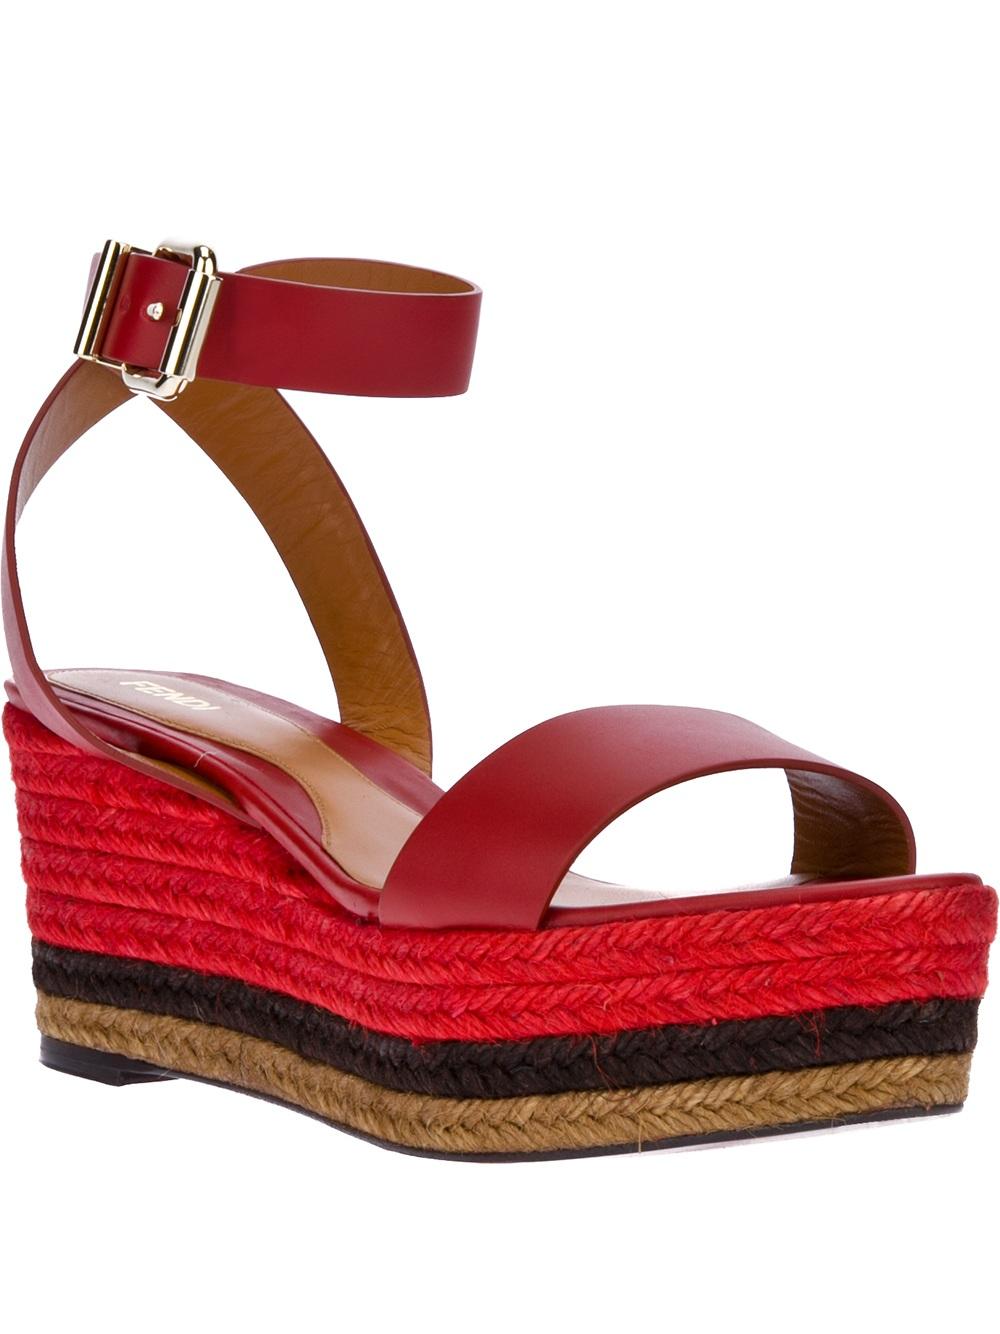 Fendi Wedge Sandal In Red Lyst